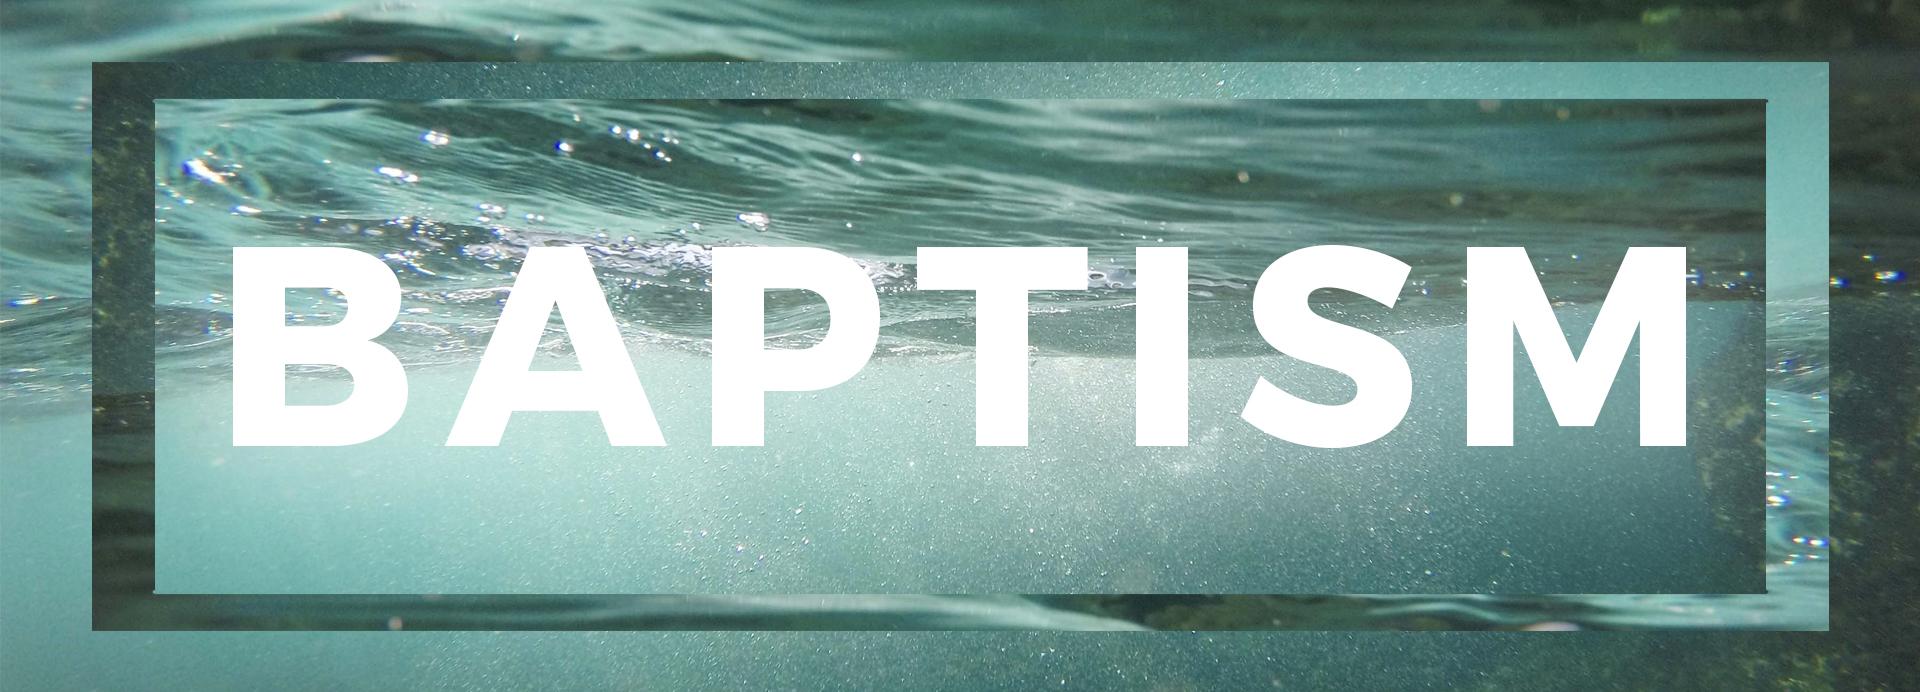 1920x692 baptism.jpg